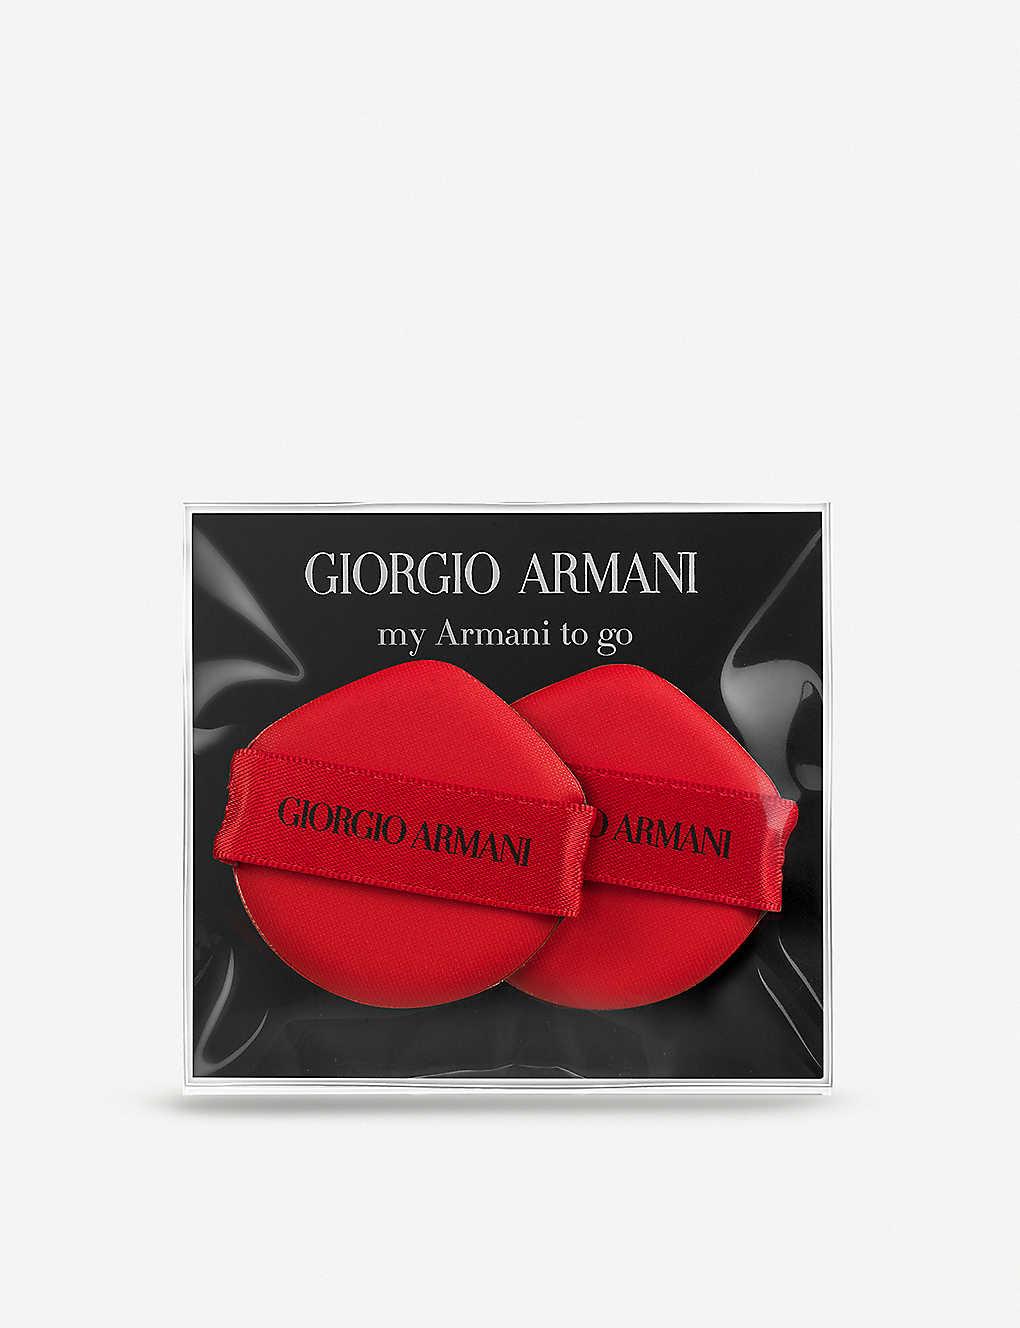 My Armani To Go Cushion Compact Sponge Duo